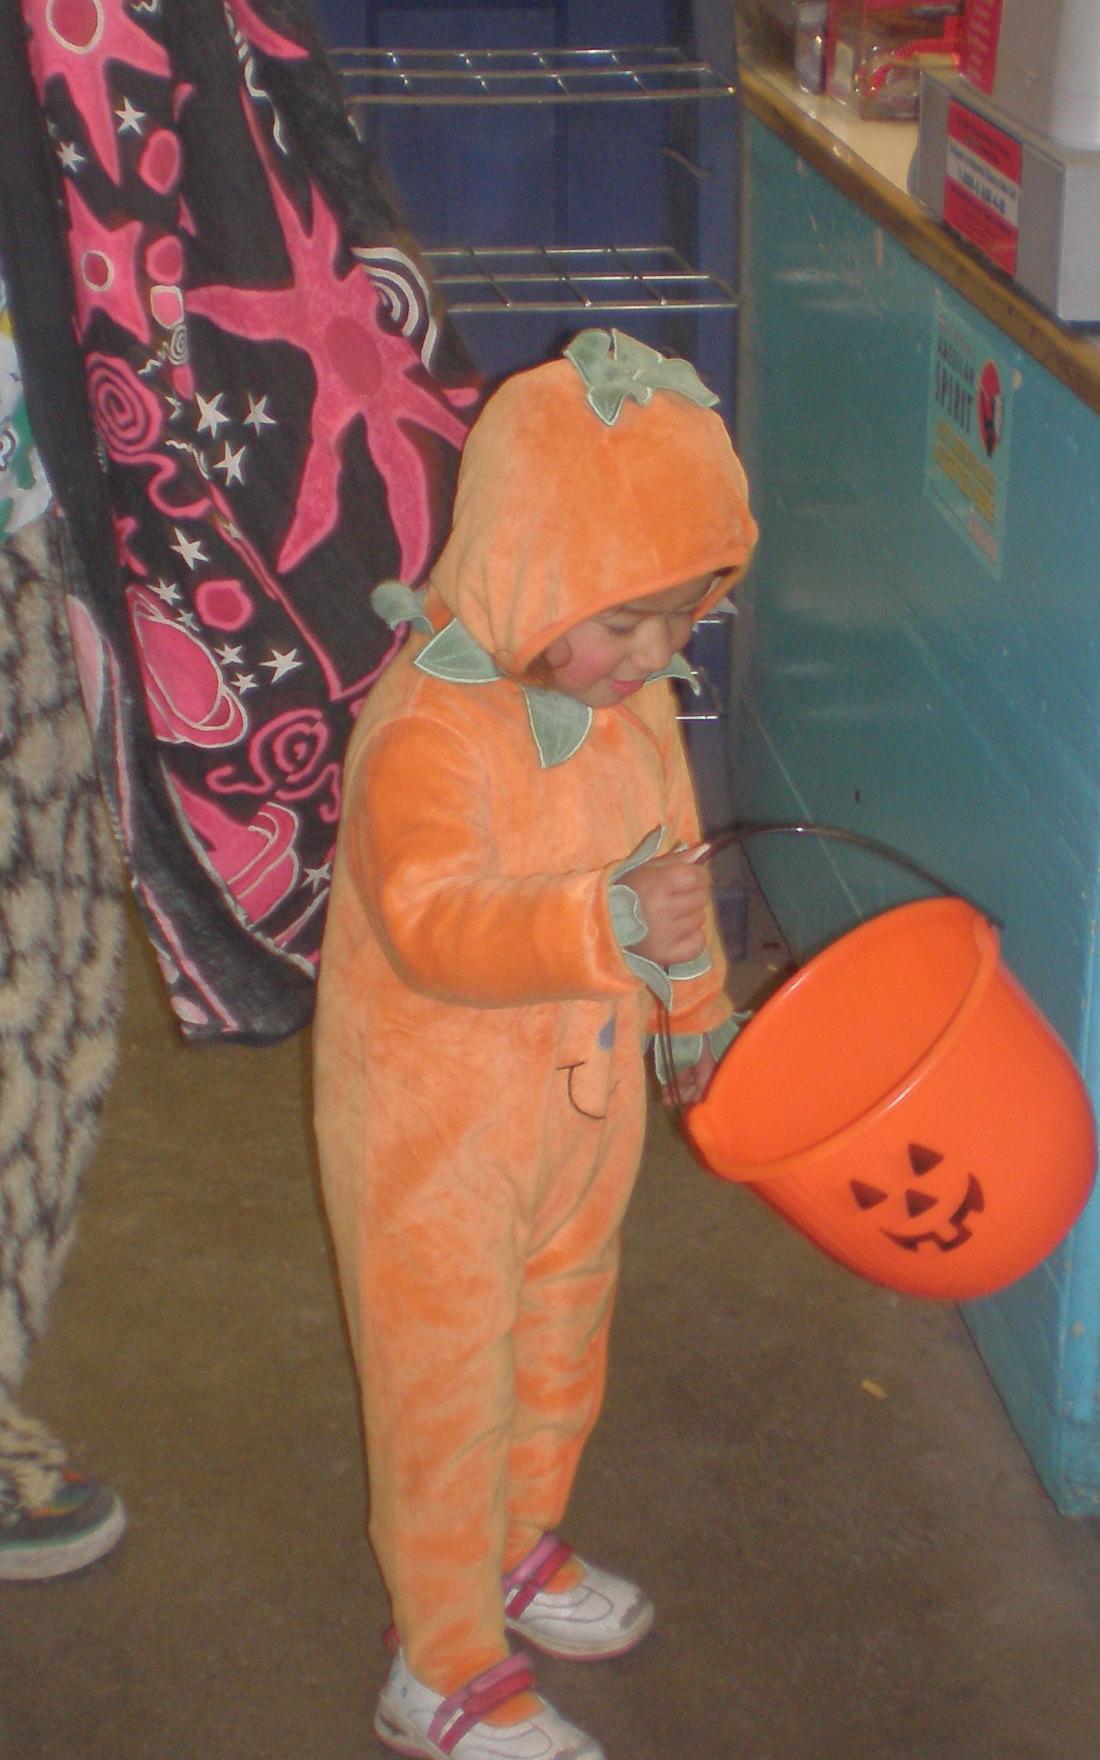 hallowe'en bucket of treats